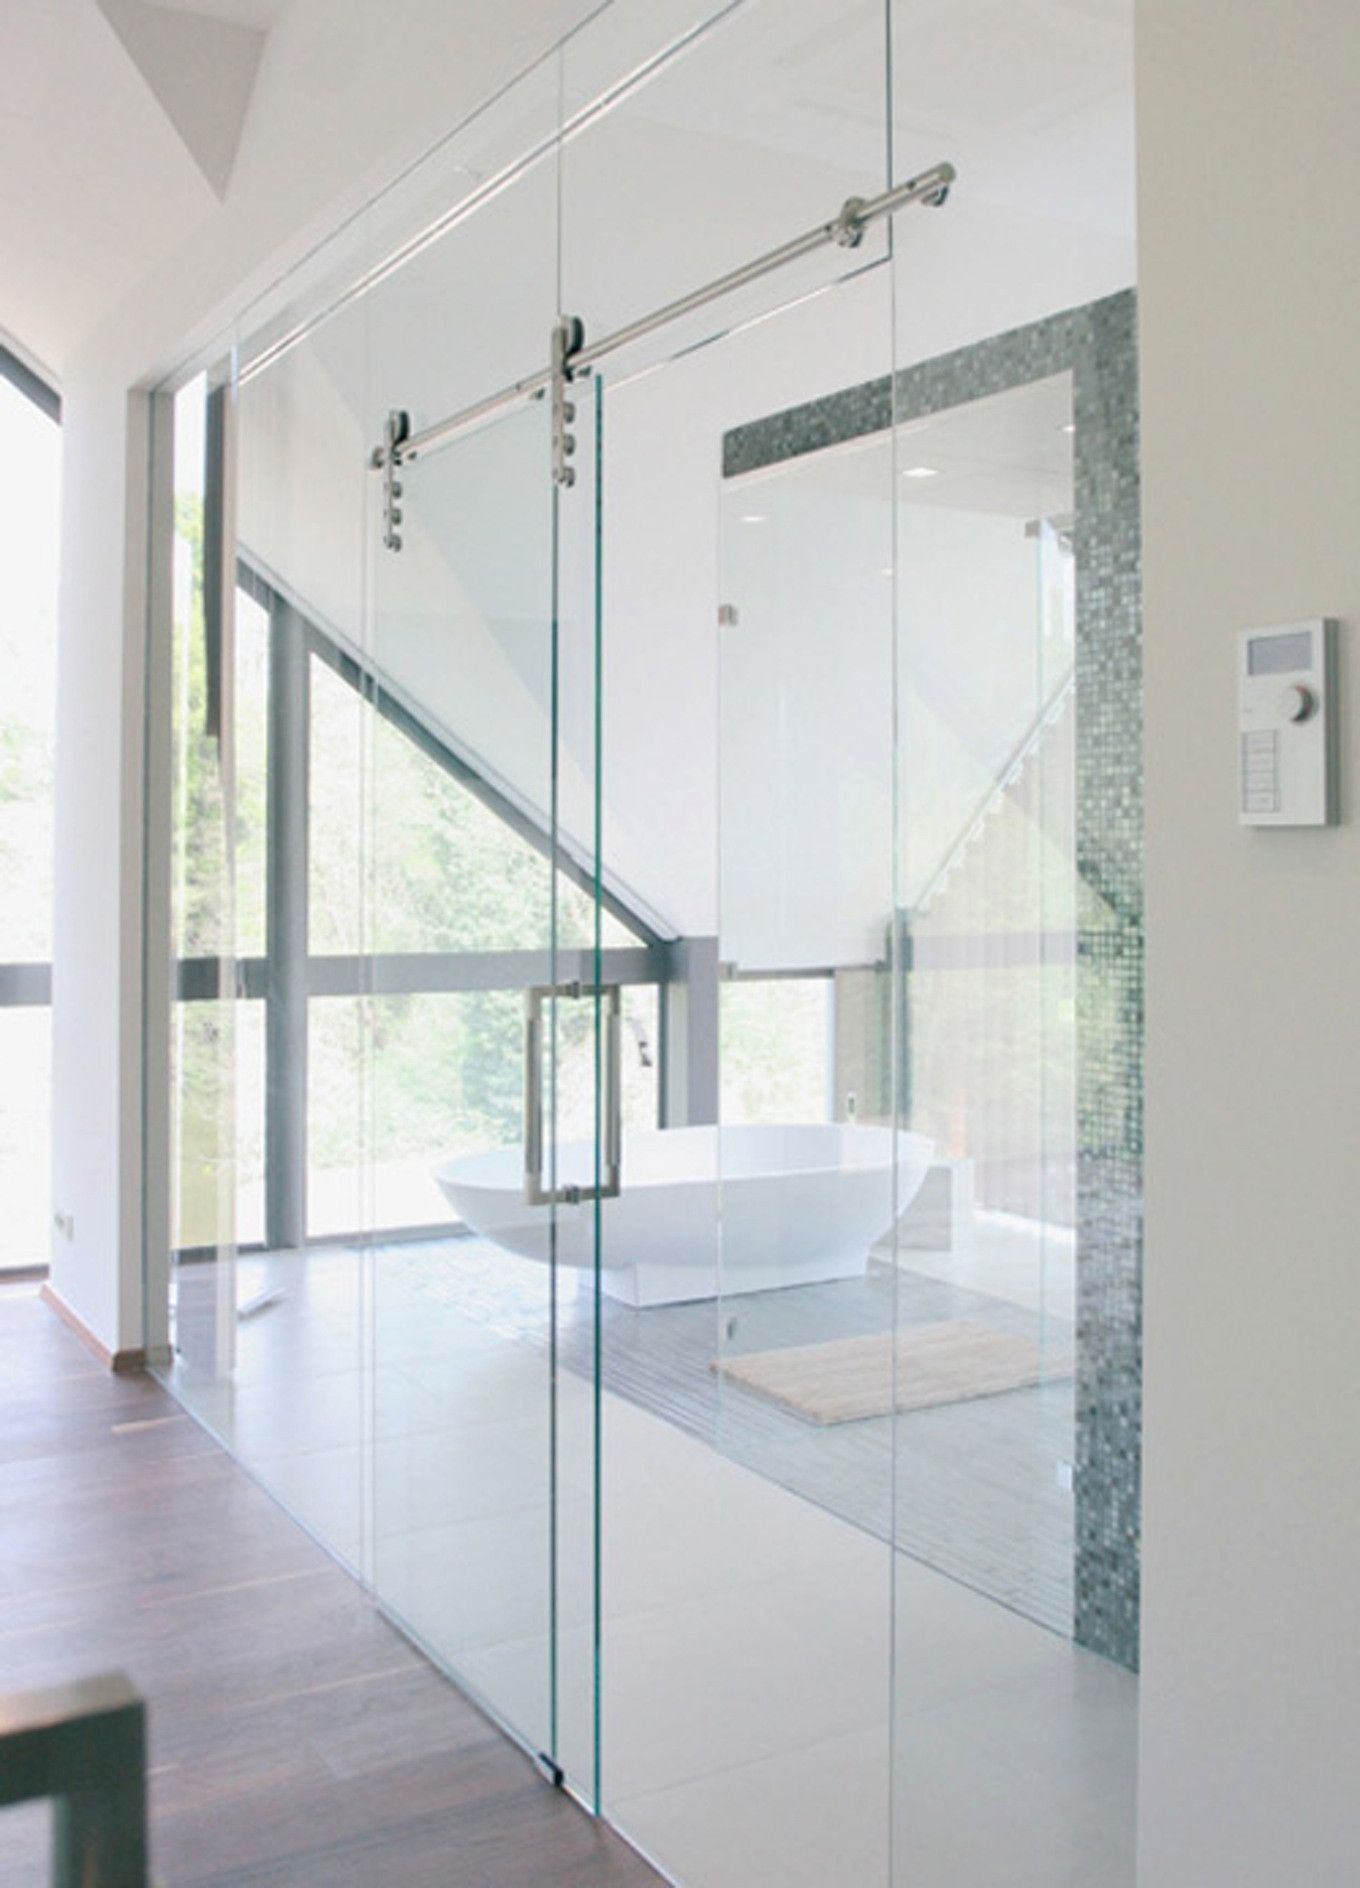 cloison suspendue leroy merlin id es d coration id es. Black Bedroom Furniture Sets. Home Design Ideas